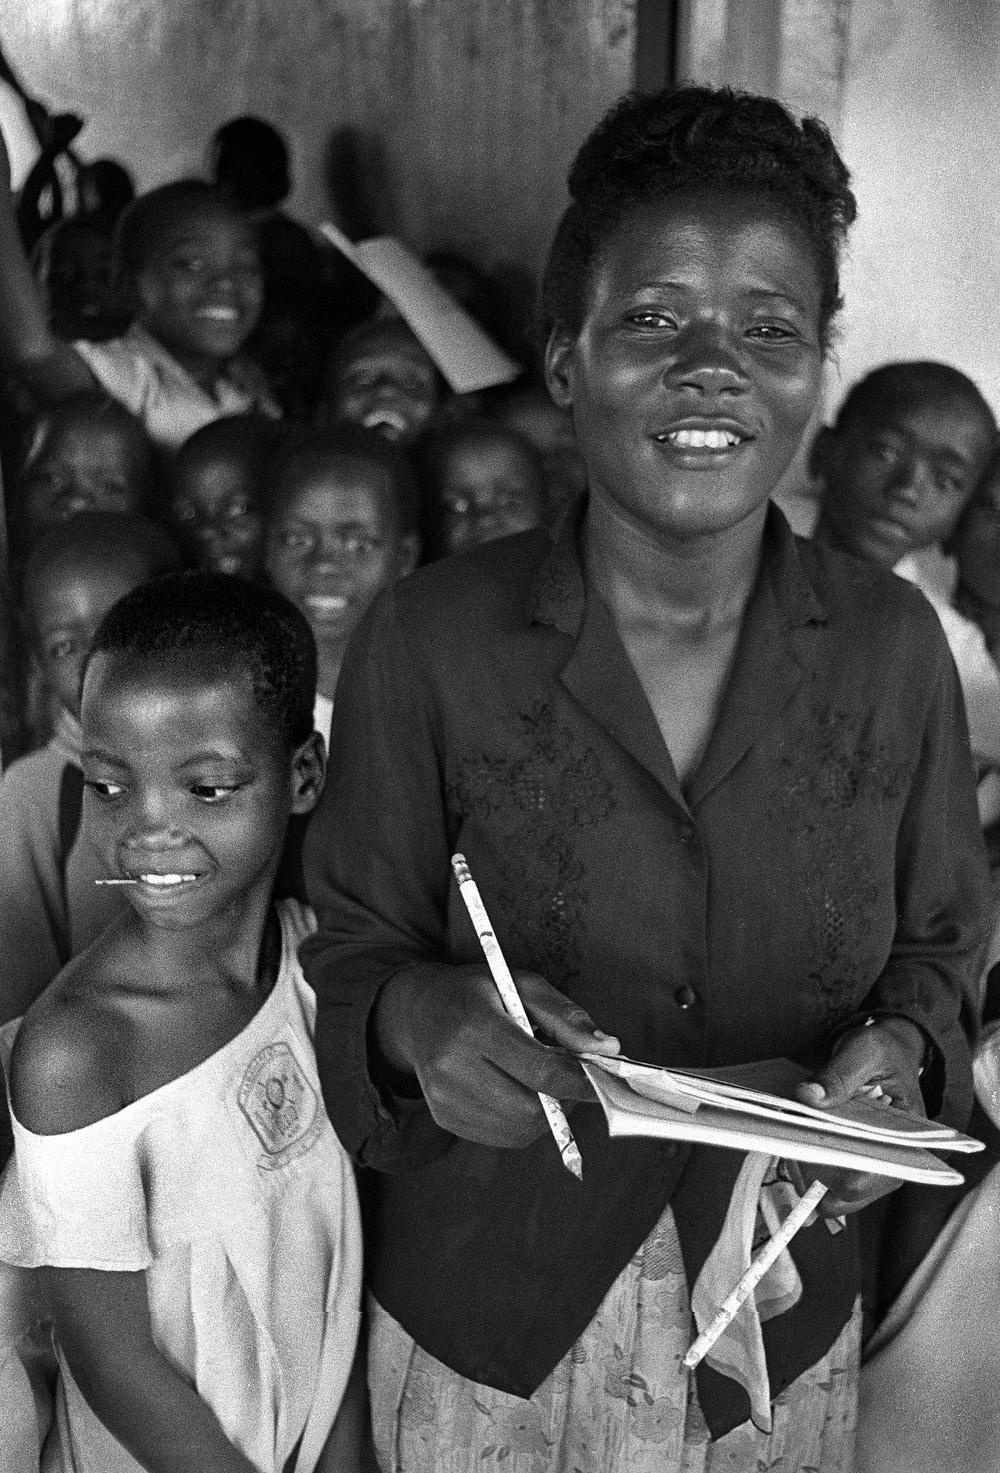 Primary school, Kampala, Uganda